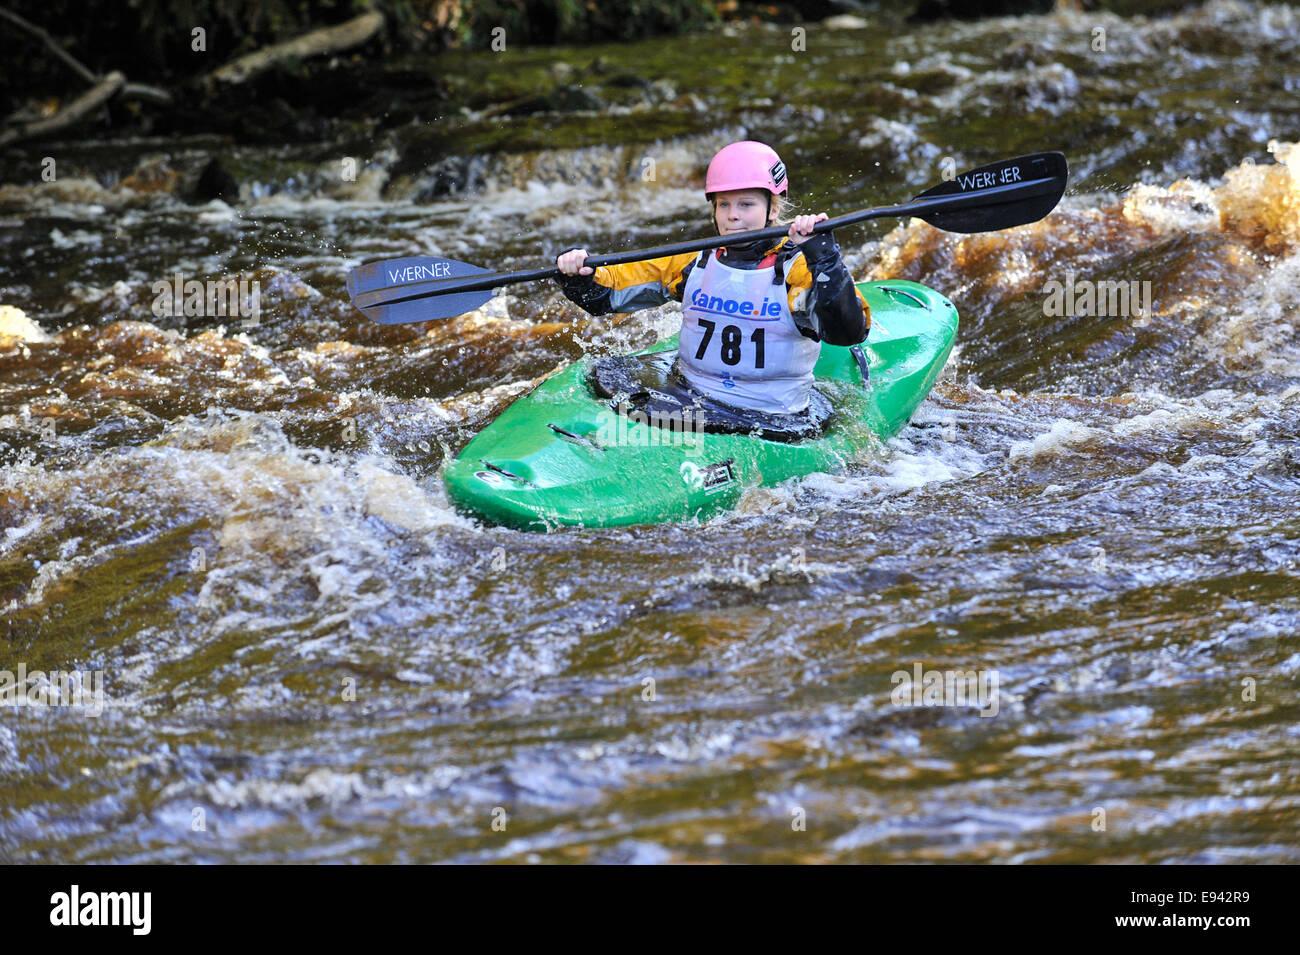 Stock Photo - Kayak compétition, Floro, comté de Donegal, Irlande. ©George Sweeney /Alamy Photo Stock